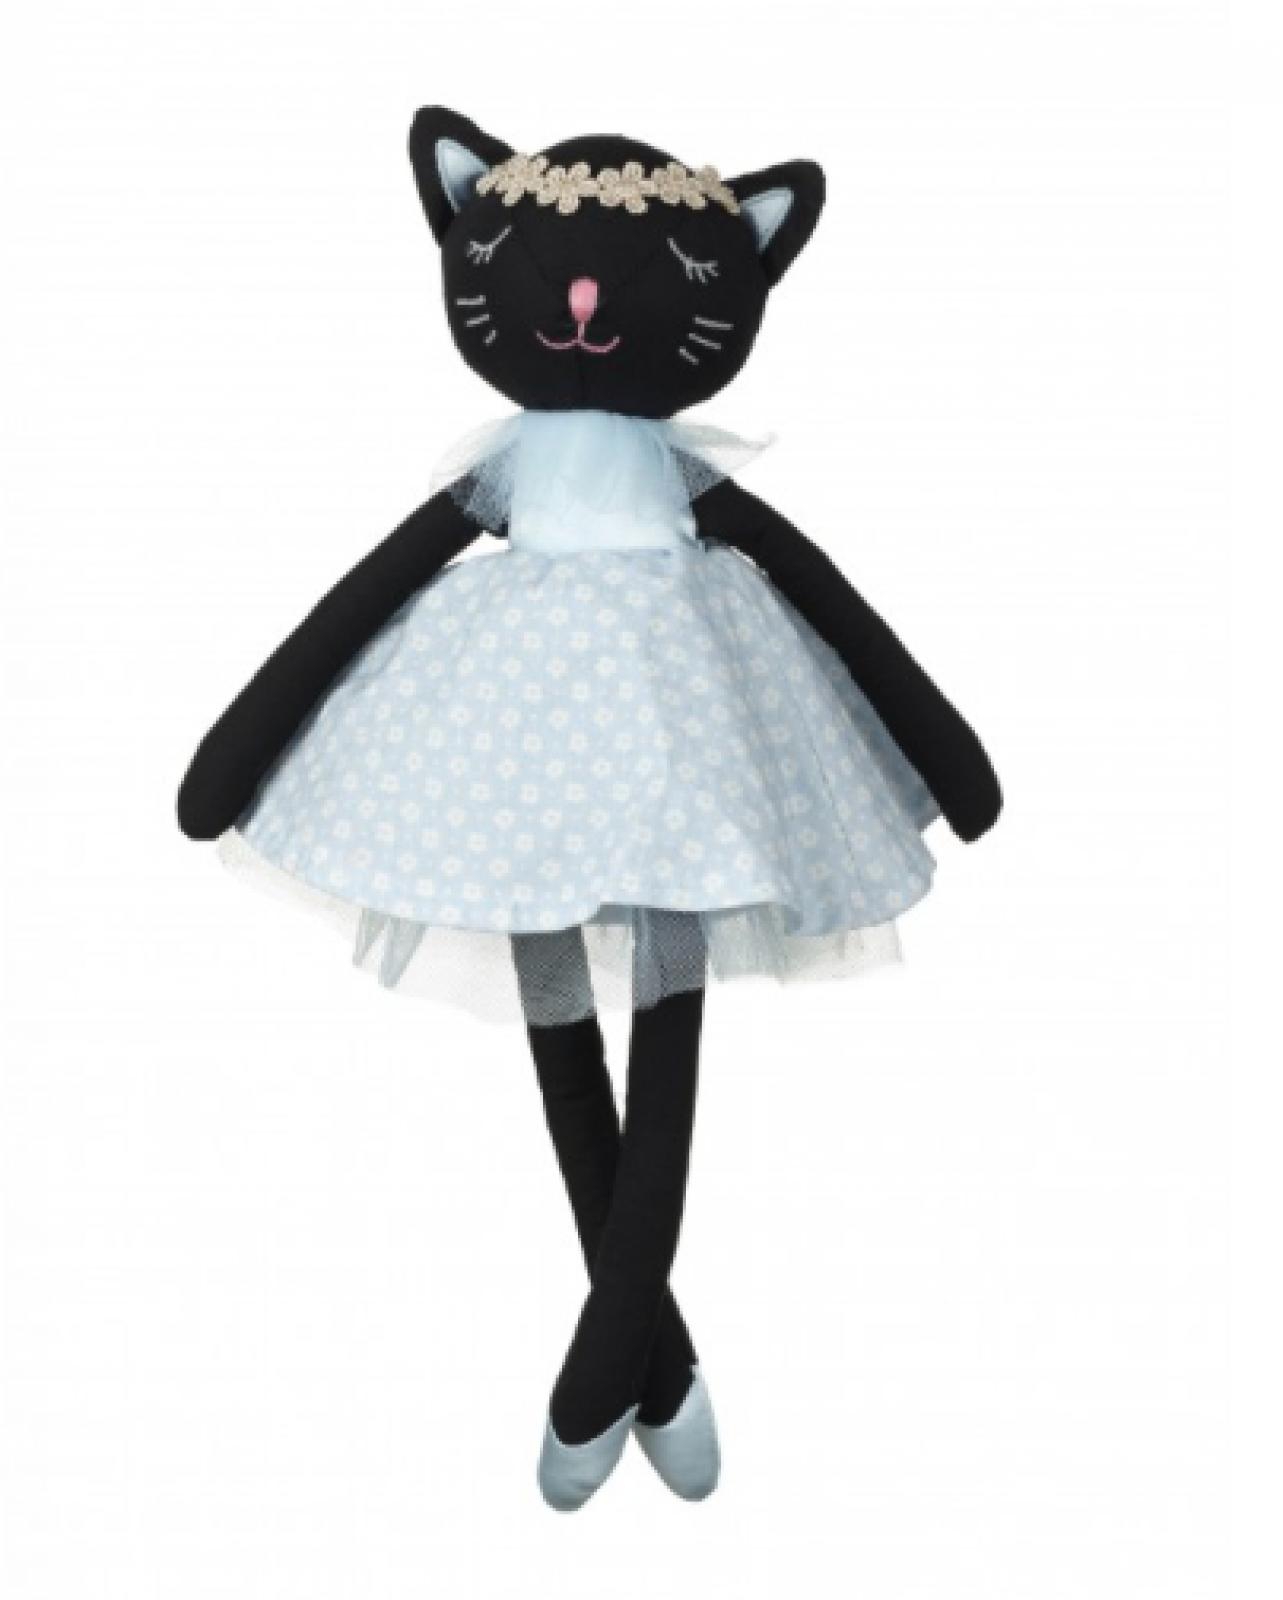 Black Cat Soft Toy With Blue Dot Dress